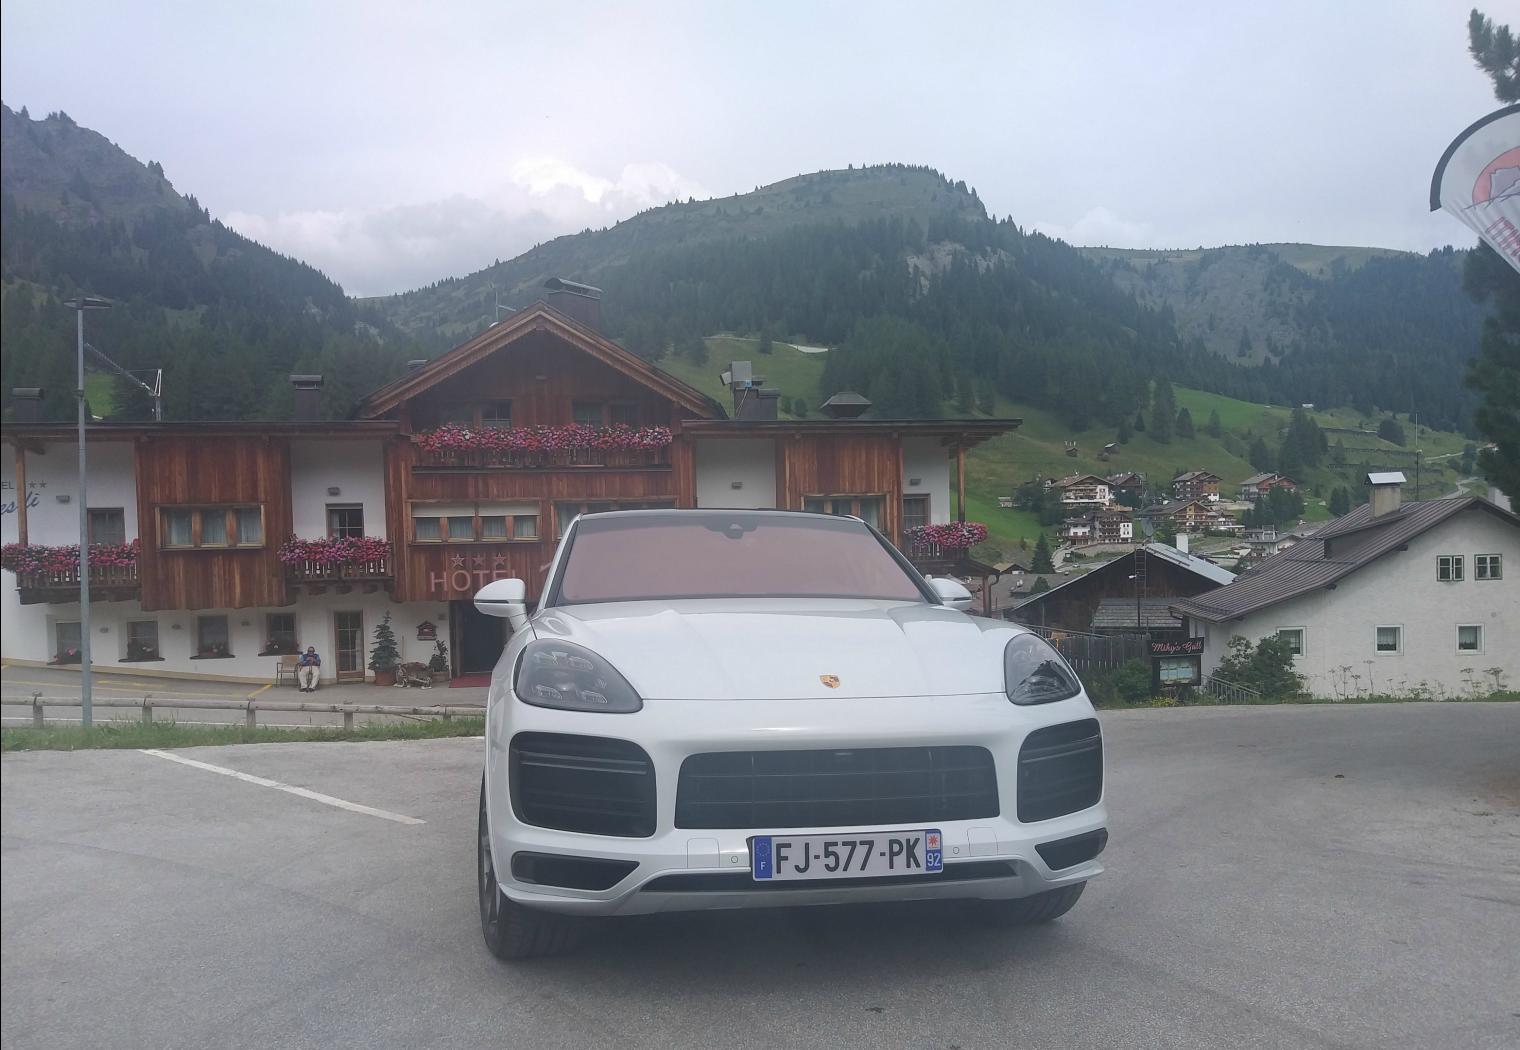 Frontale nuova Porsche Cayenne Coupé 2019